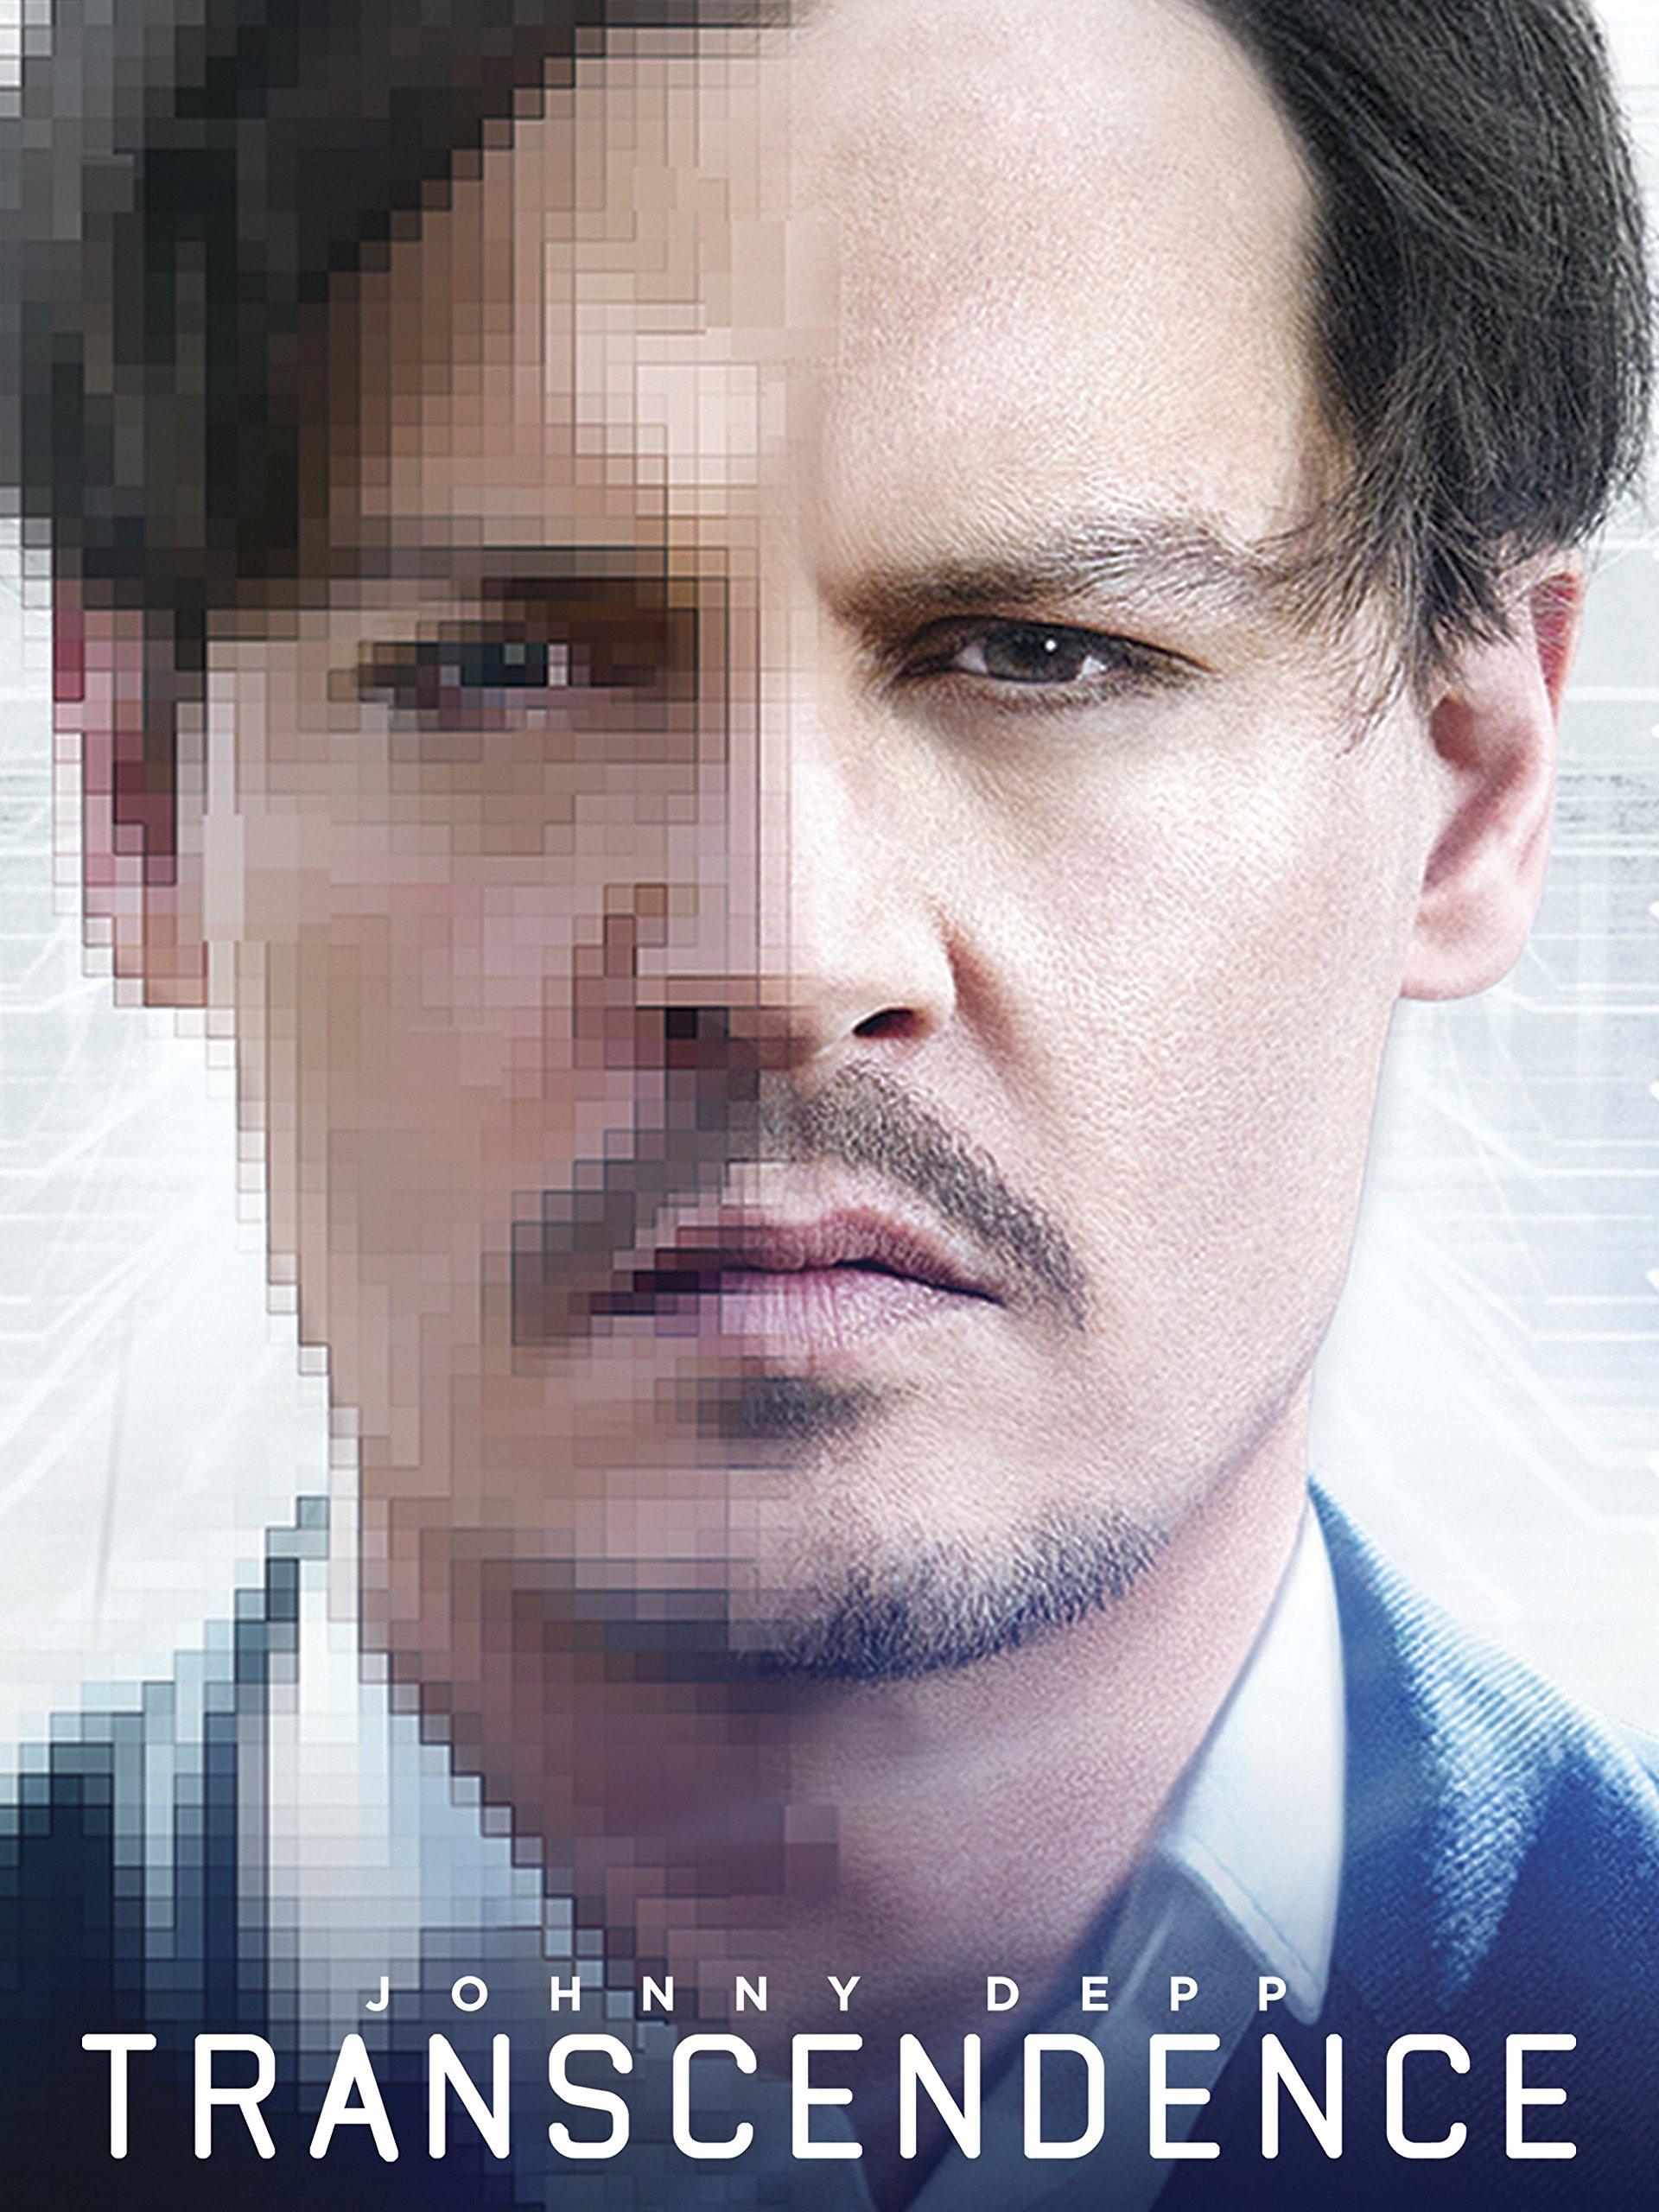 Amazon.com: Transcendence (2014): Johnny Depp, Rebecca Hall, Paul ...